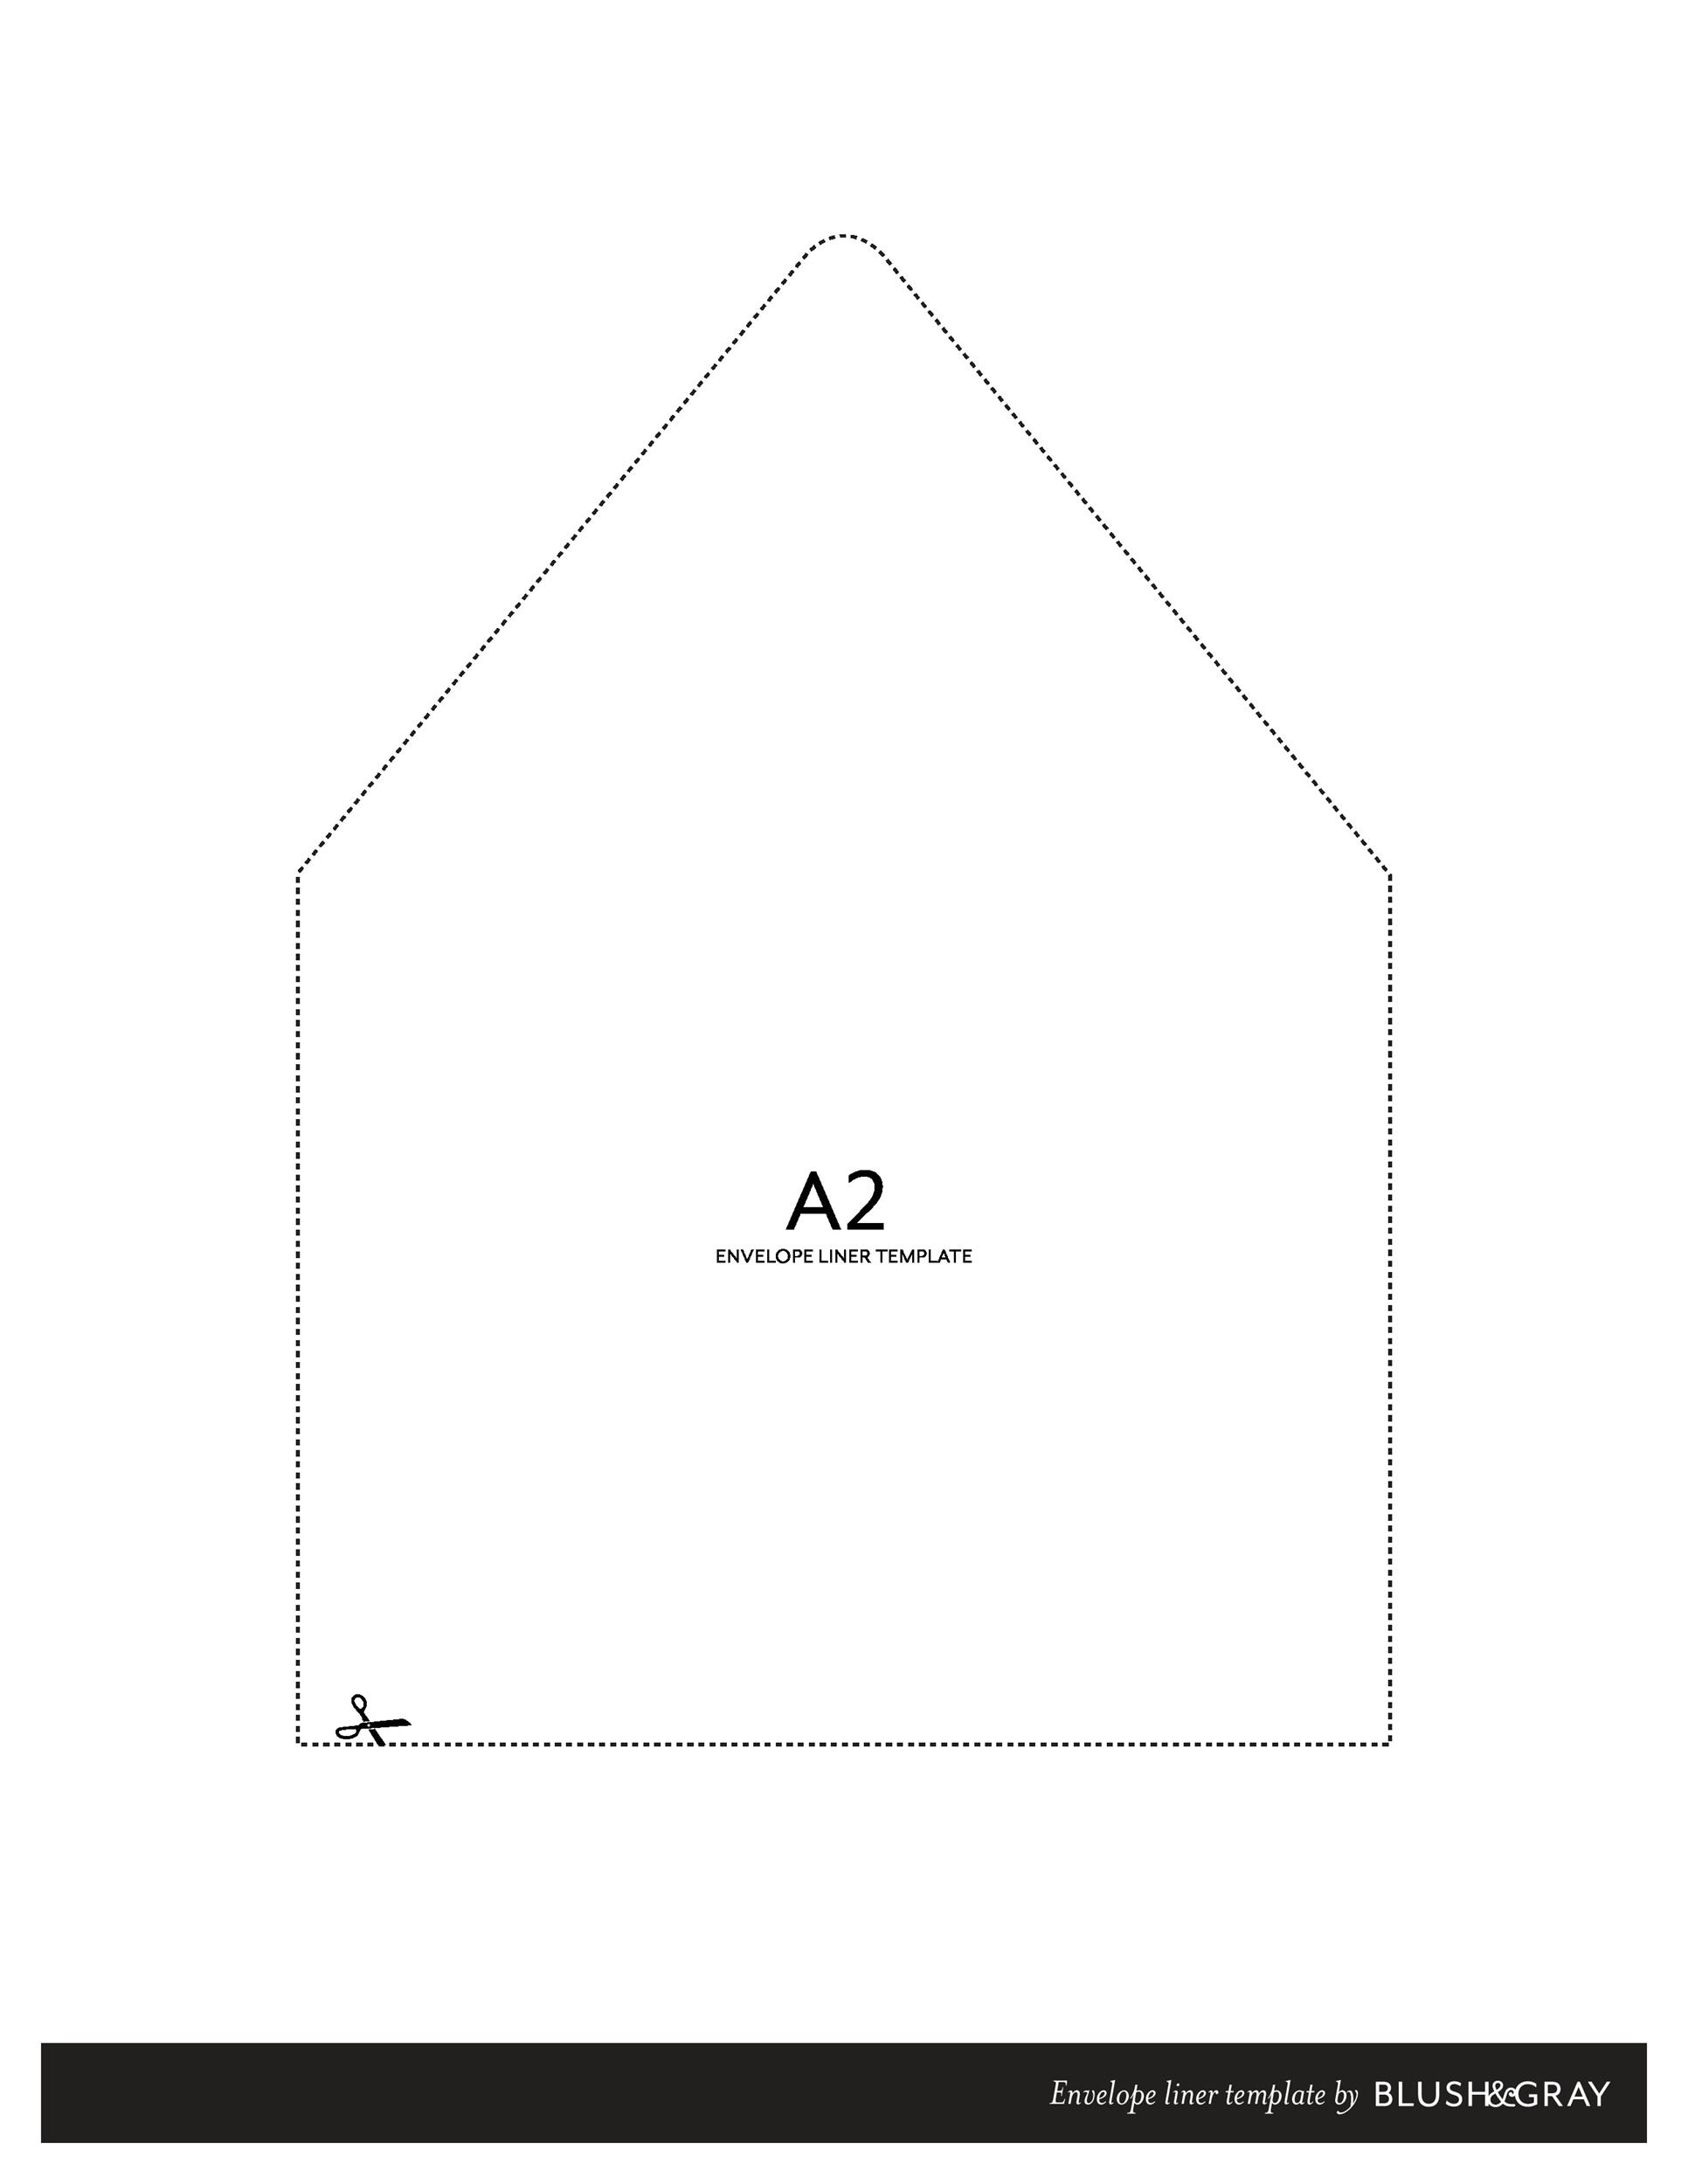 006 Awful 5x7 Envelope Template Word Sample  Microsoft FreeFull